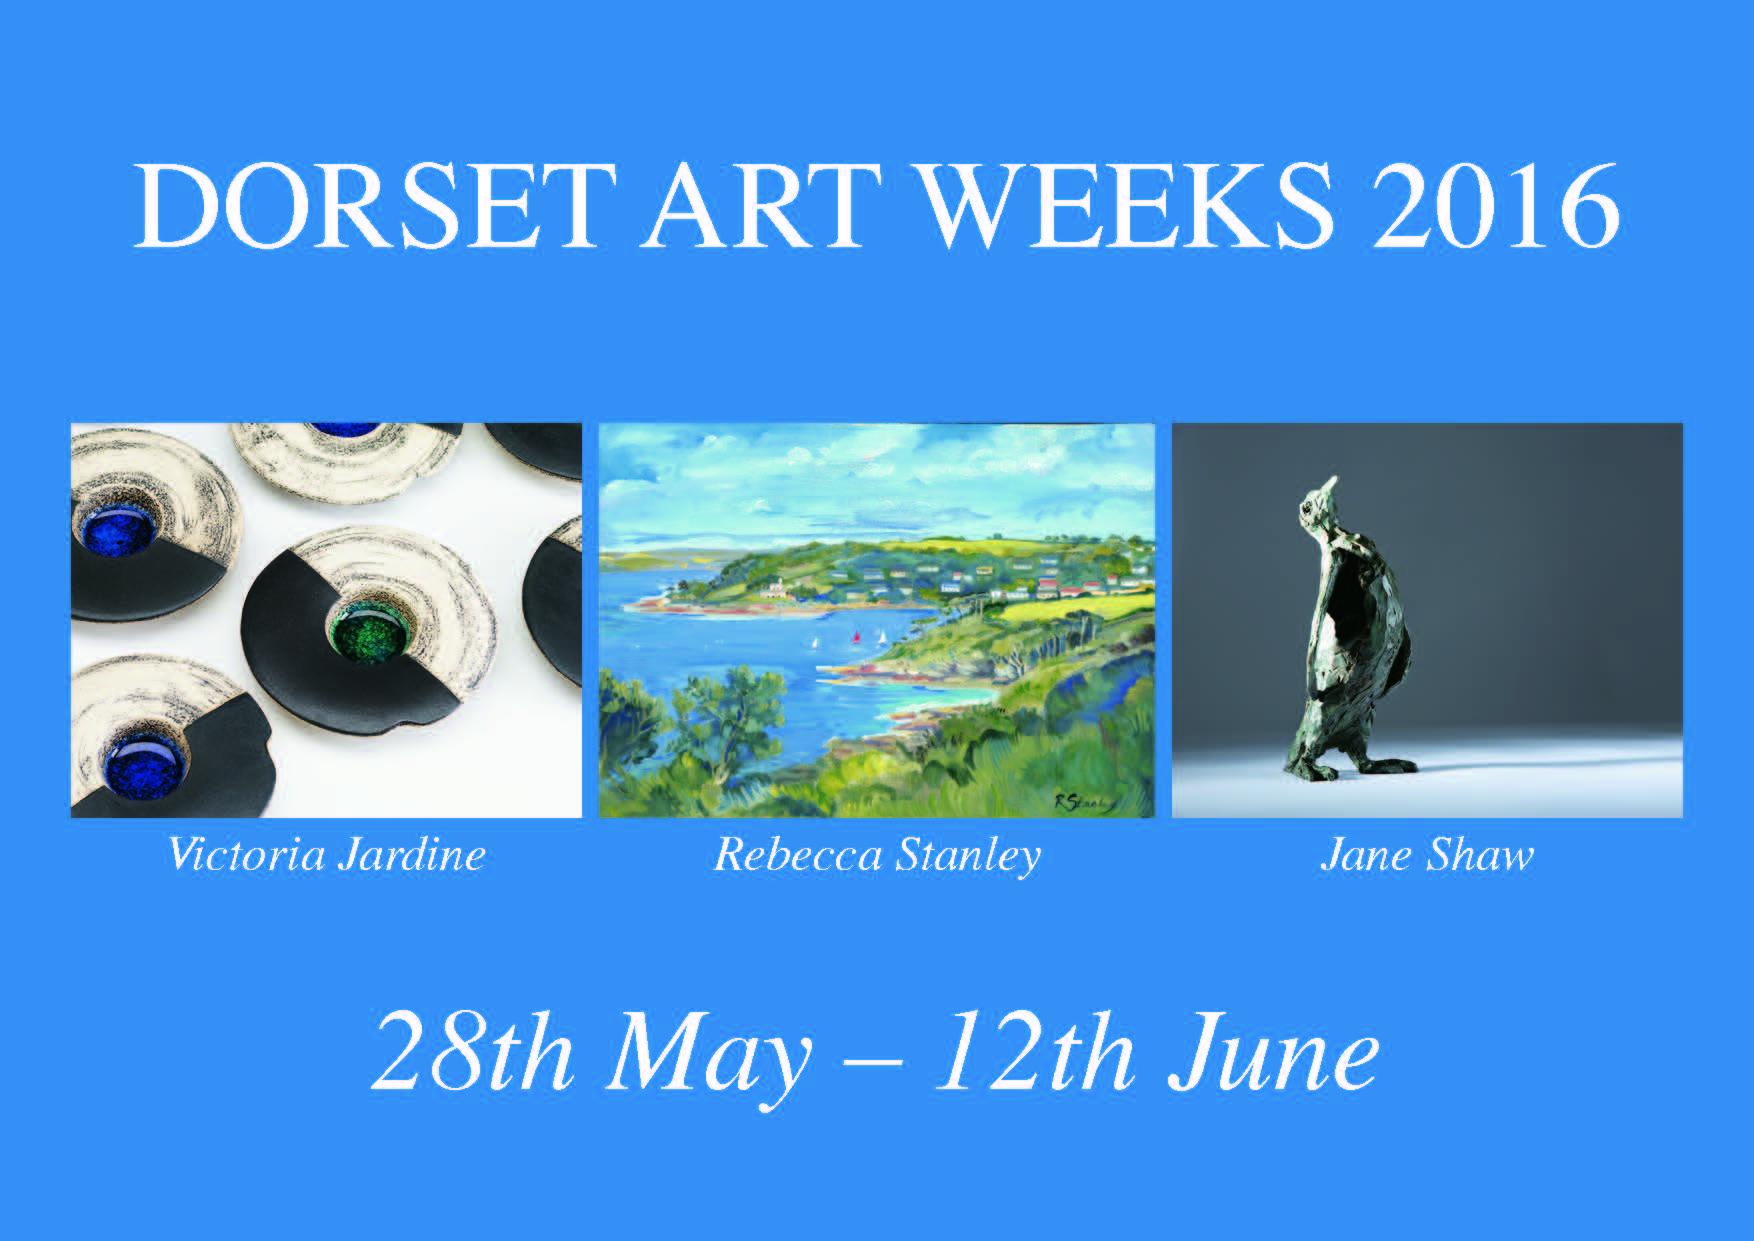 Invitation Card for Dorset Art Weeks - Front